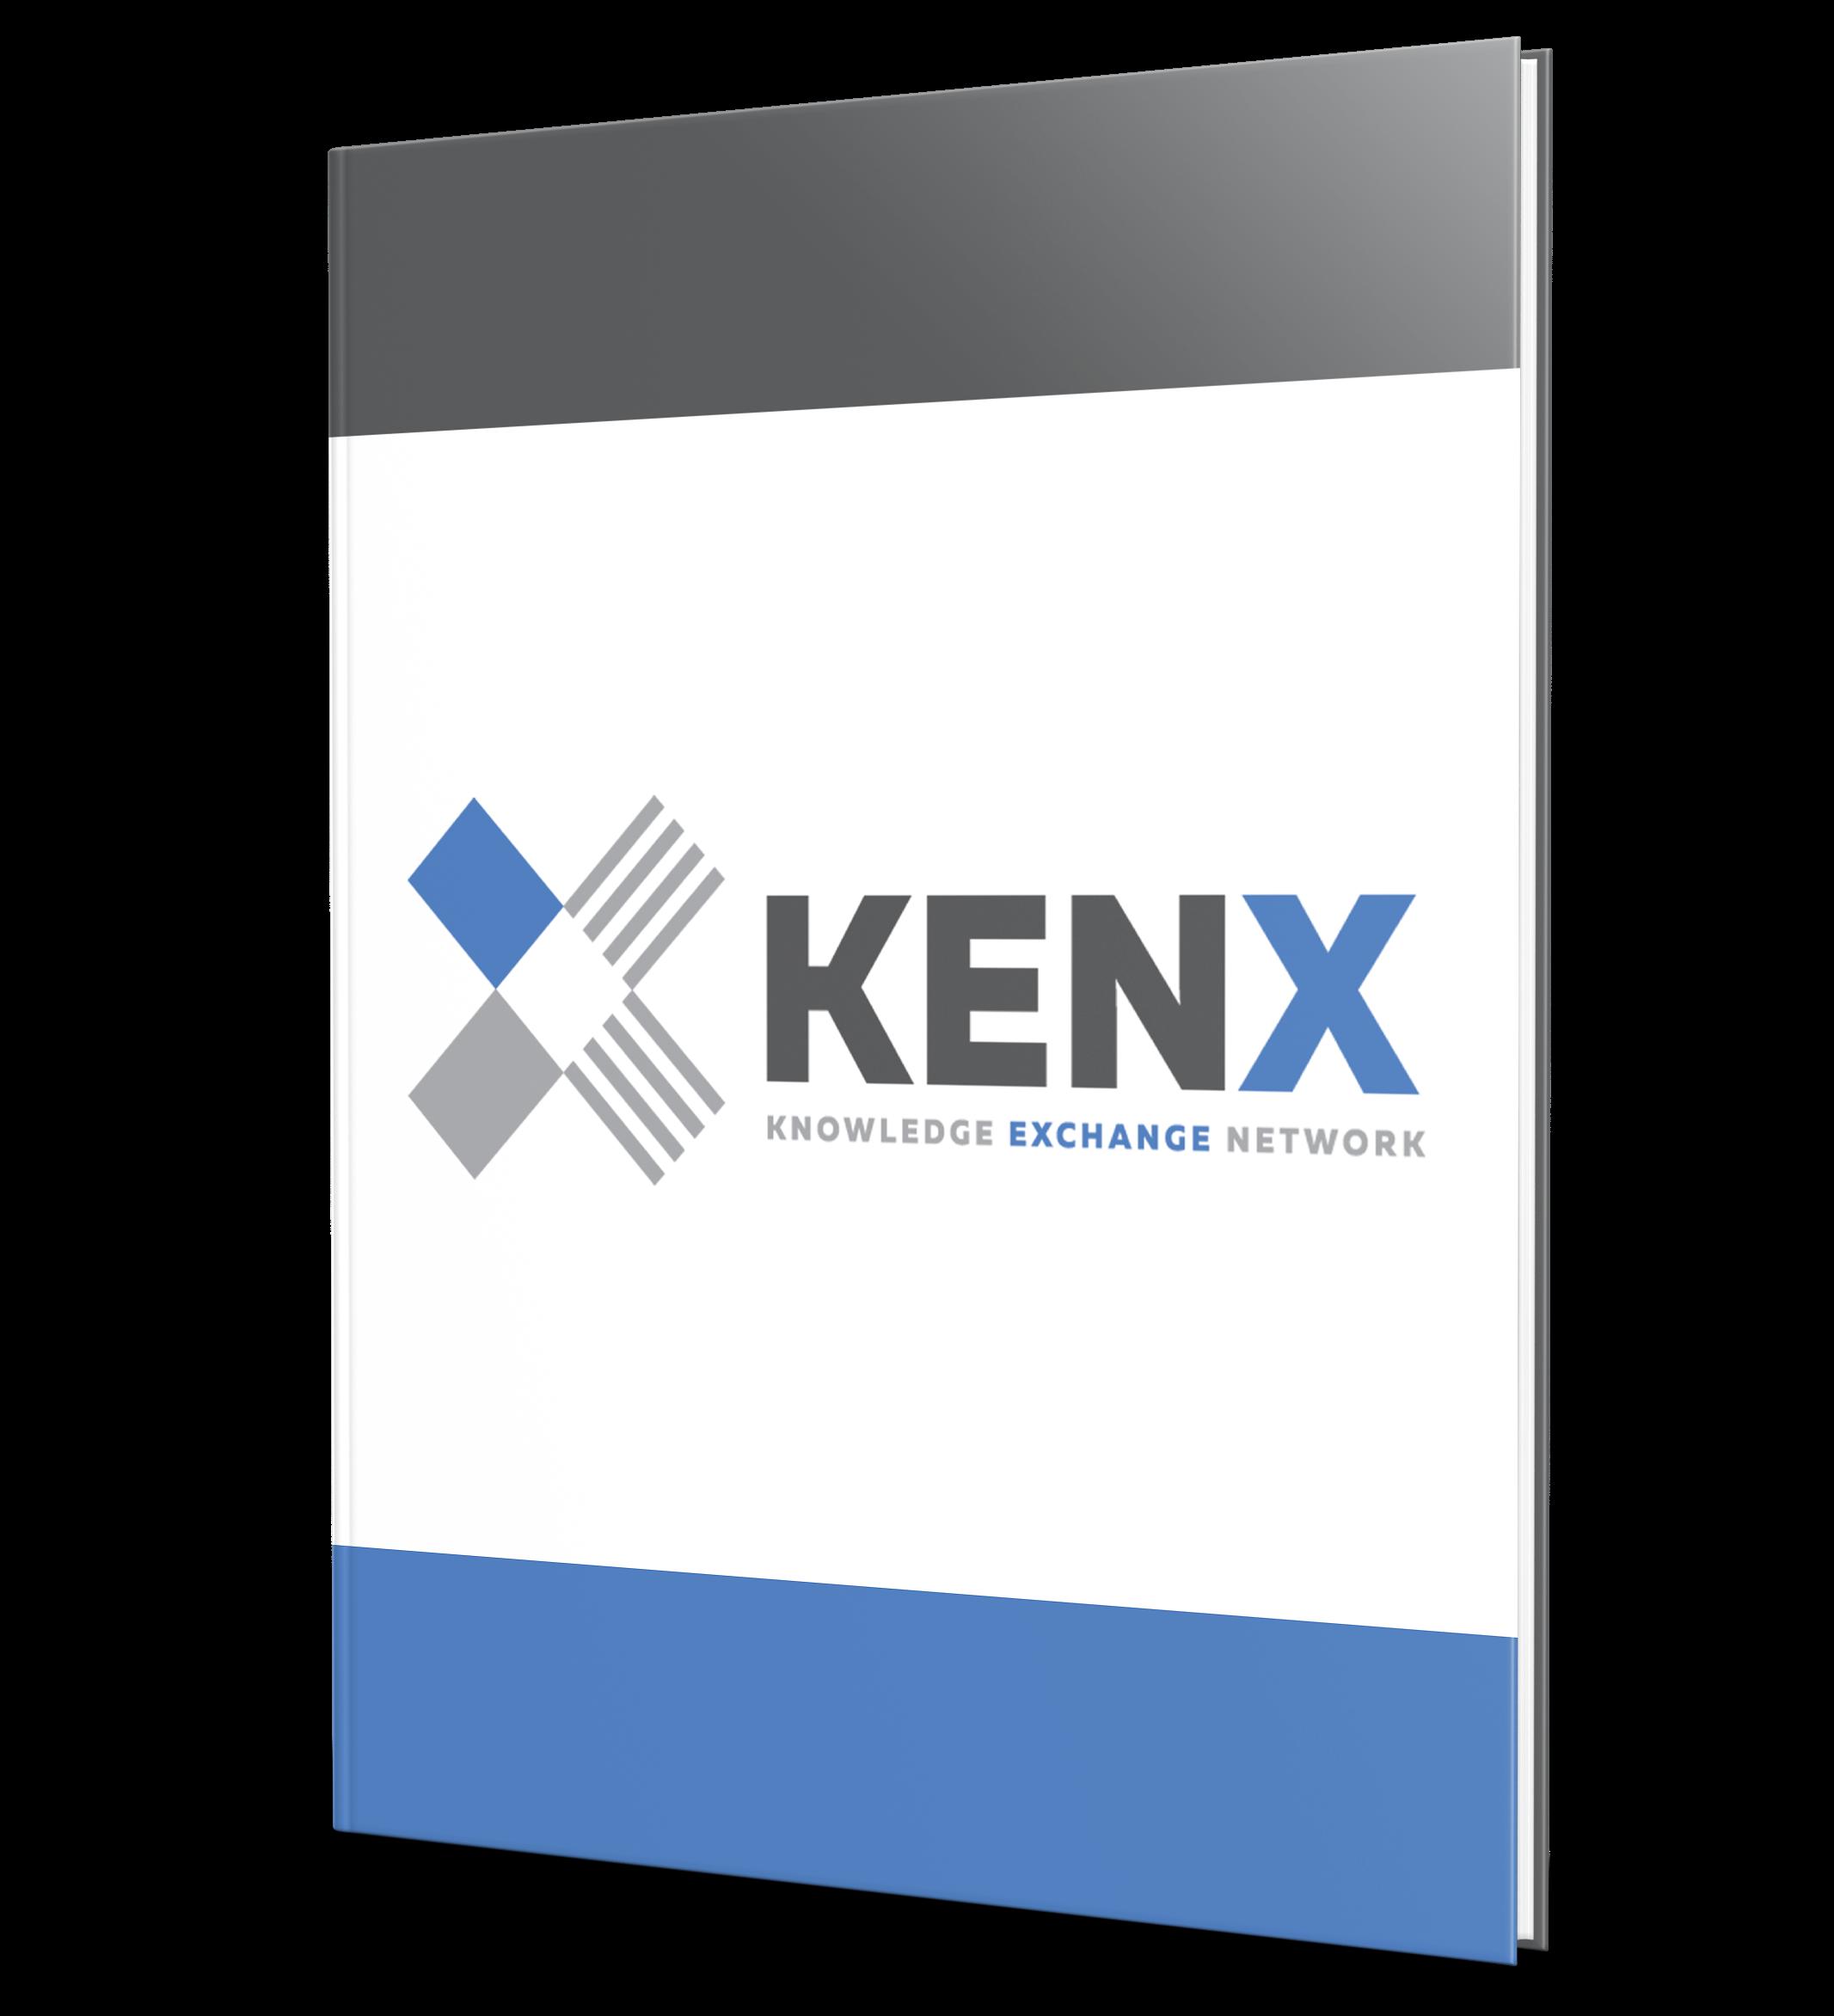 kenx_mock.png